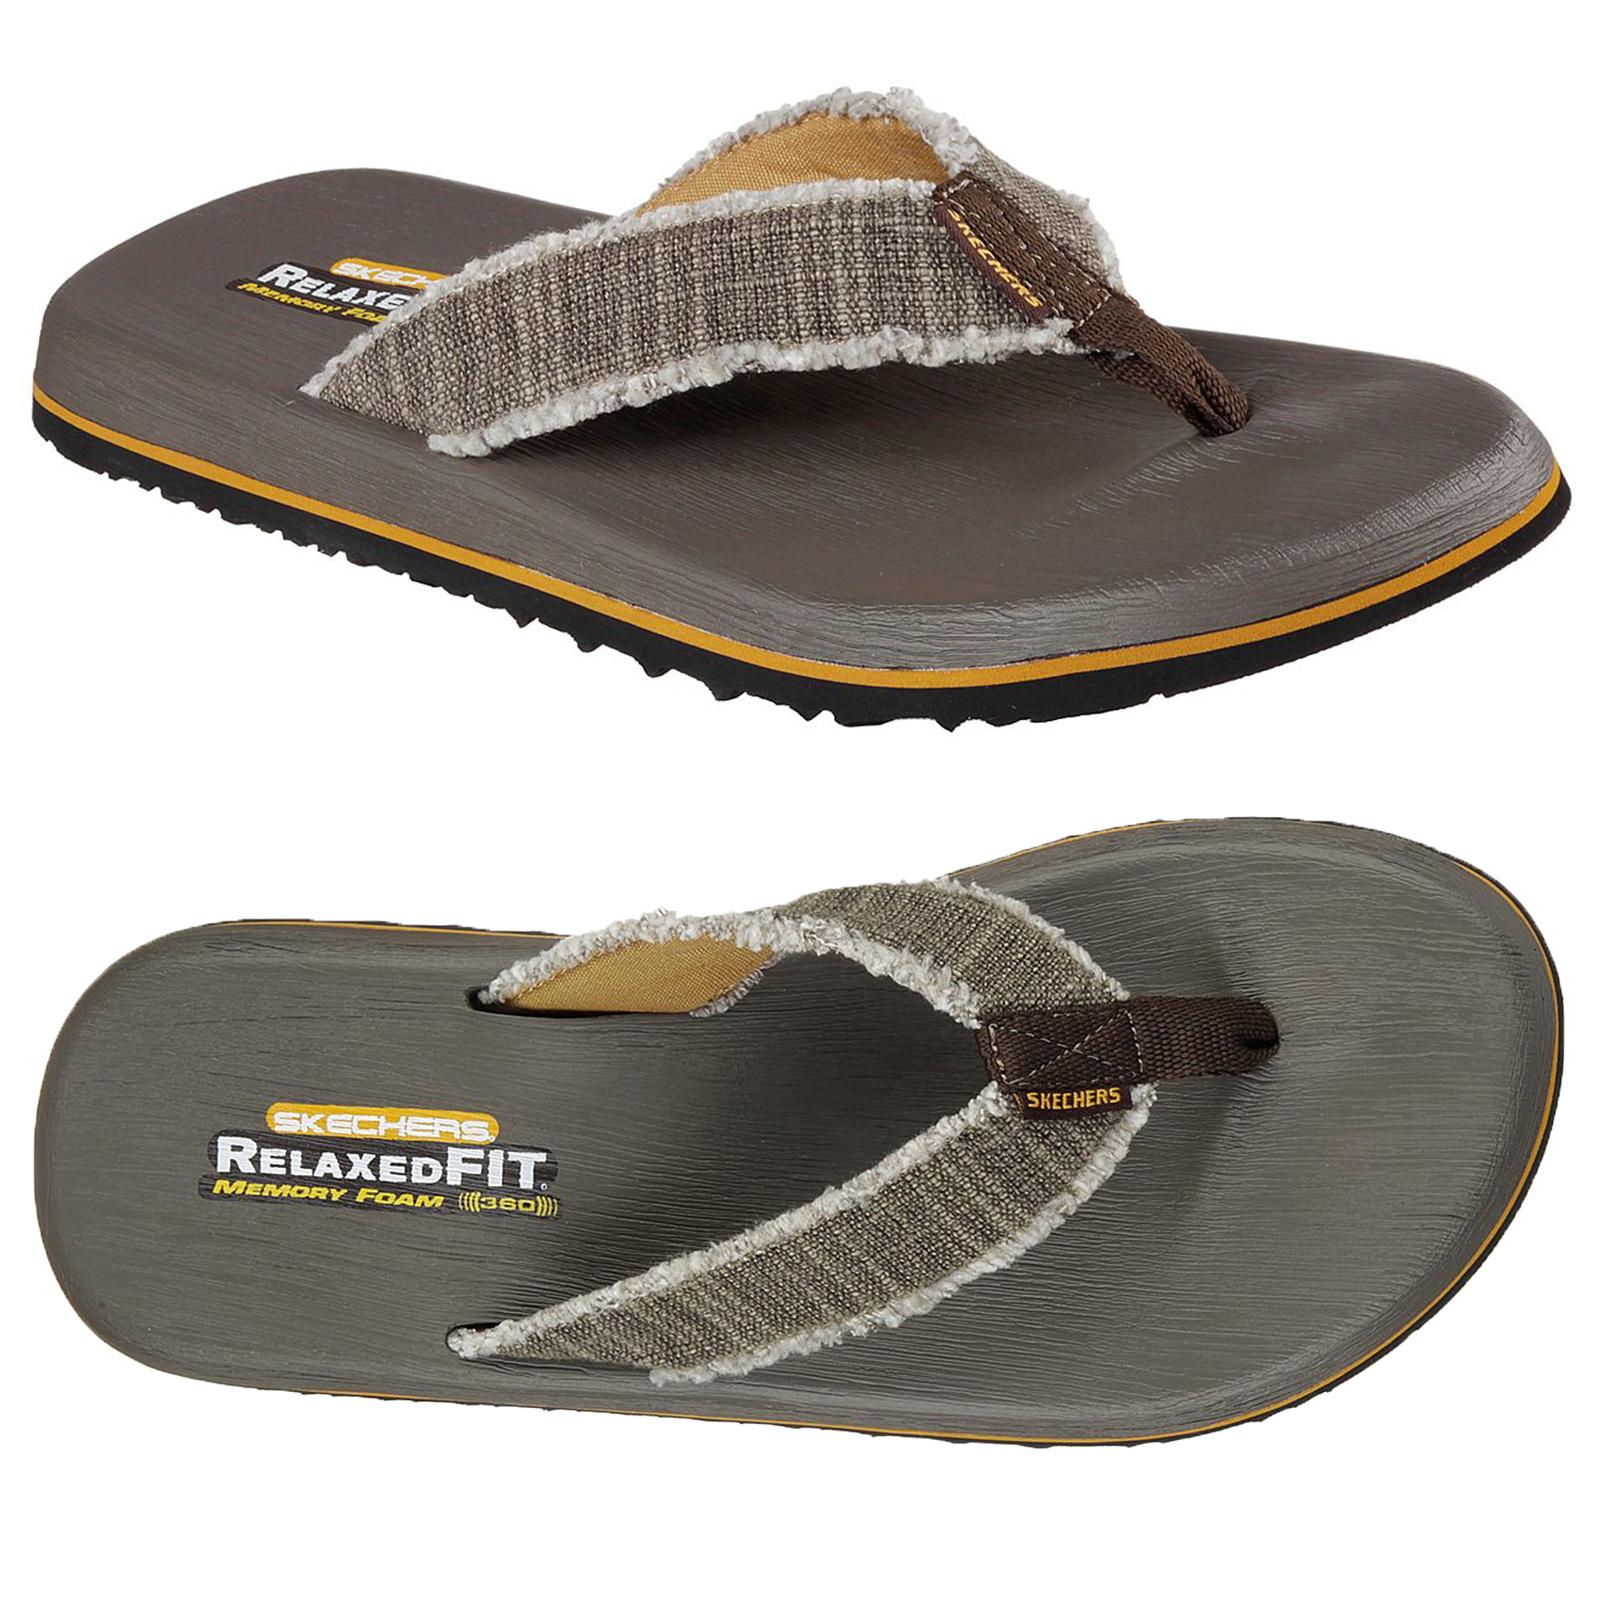 59f9fa15b86f Skechers Mens Tantric Salman Sandals Relaxed Fit Memory Foam 360 ...